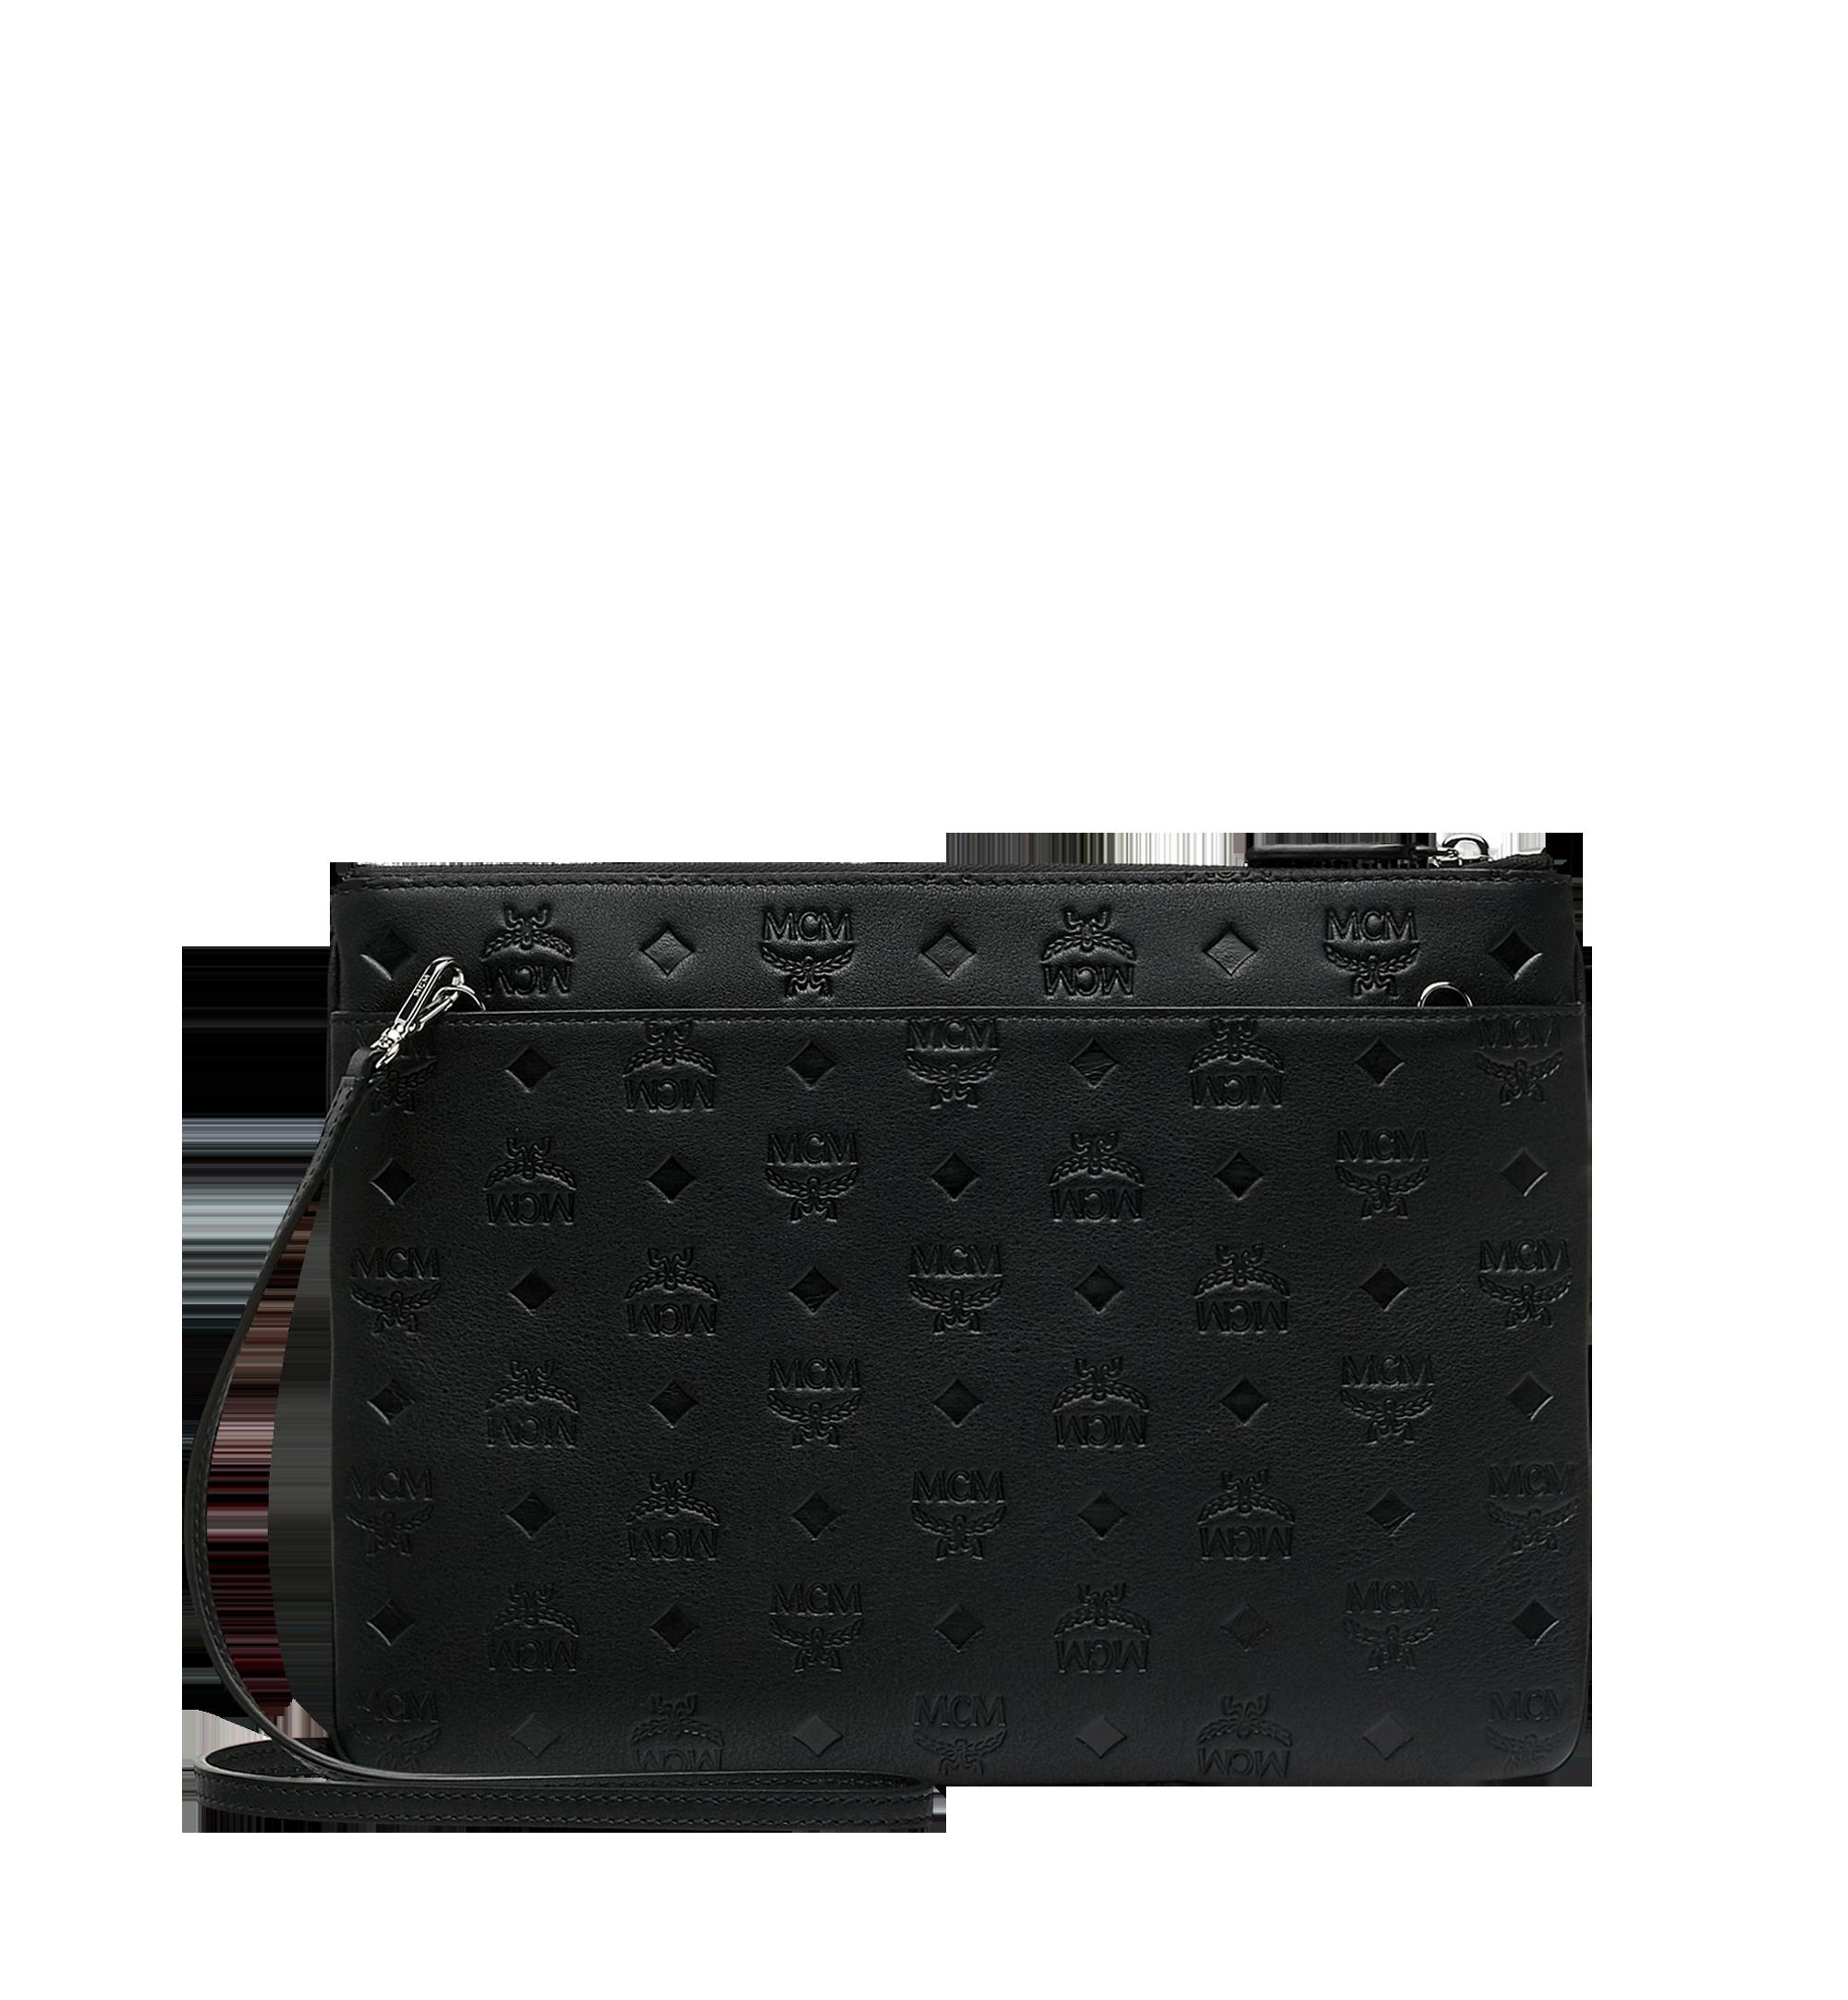 MCM Crossbody Pouch in Monogram Leather Black MYZ9SKM42BK001 Alternate View 3